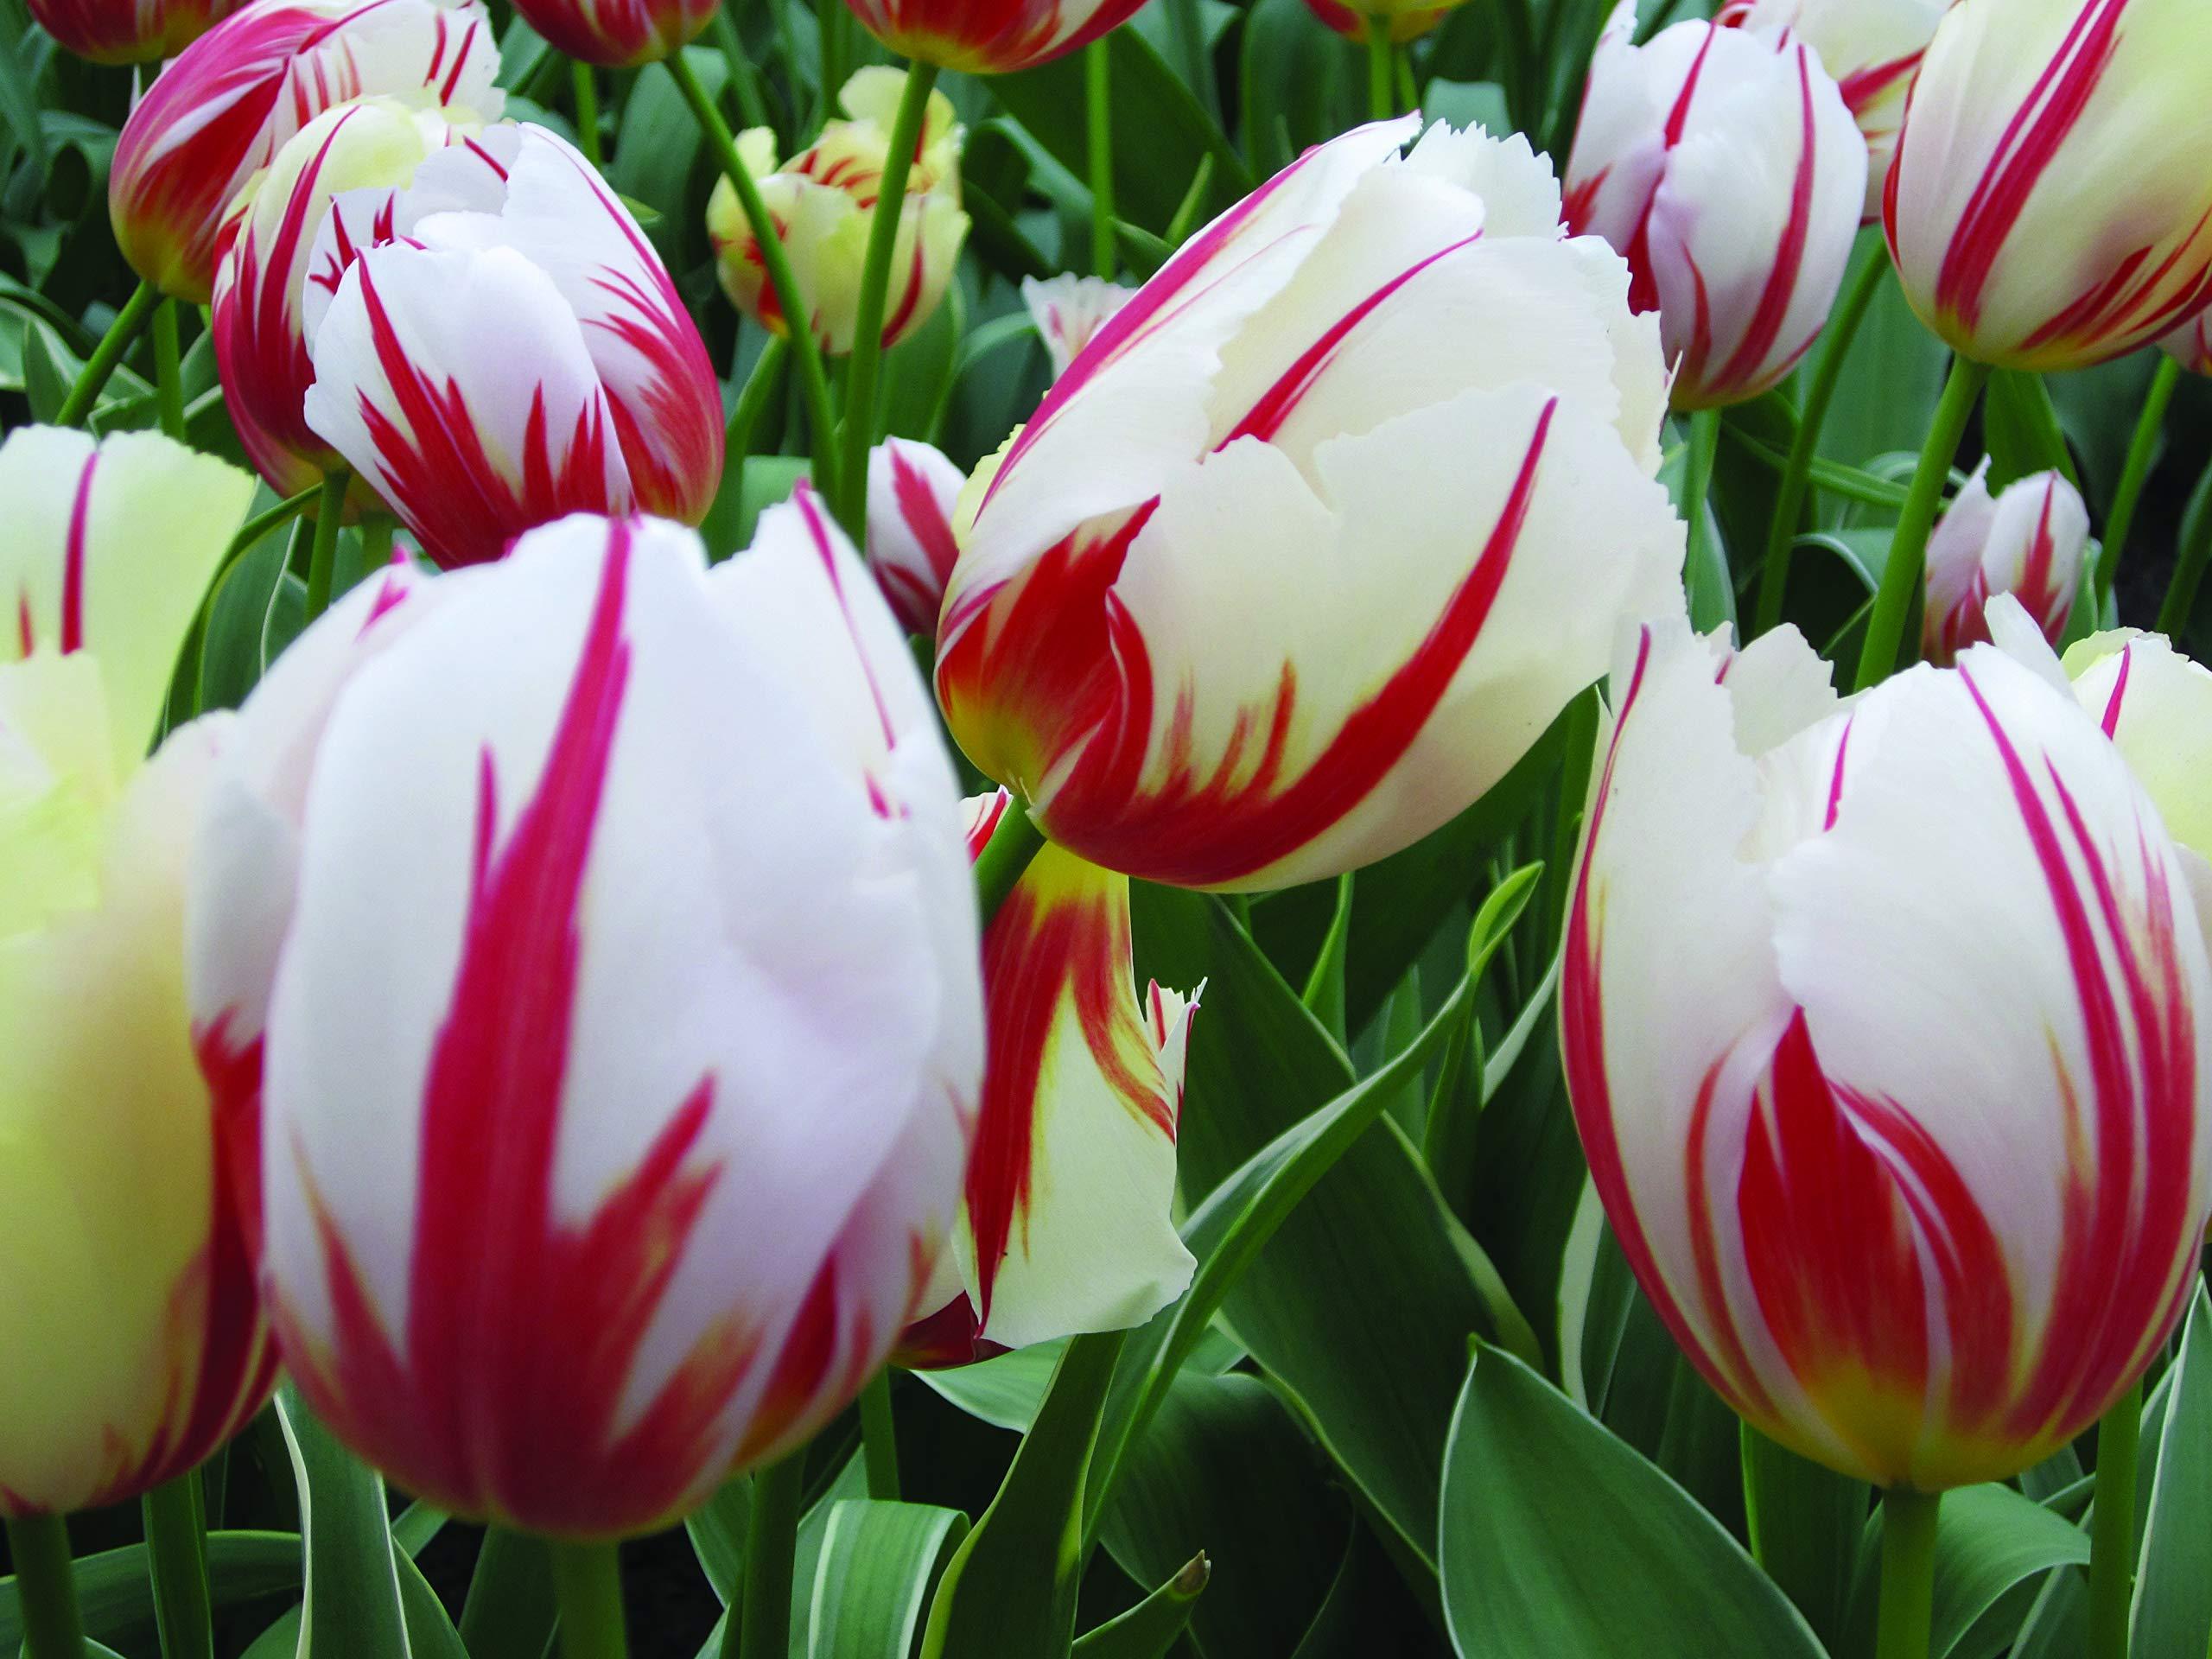 Burpee's Carnival de Rio Tulip - 10 Flower Bulbs | Red & White | 12 - 14cm Bulb Diameter by Burpee